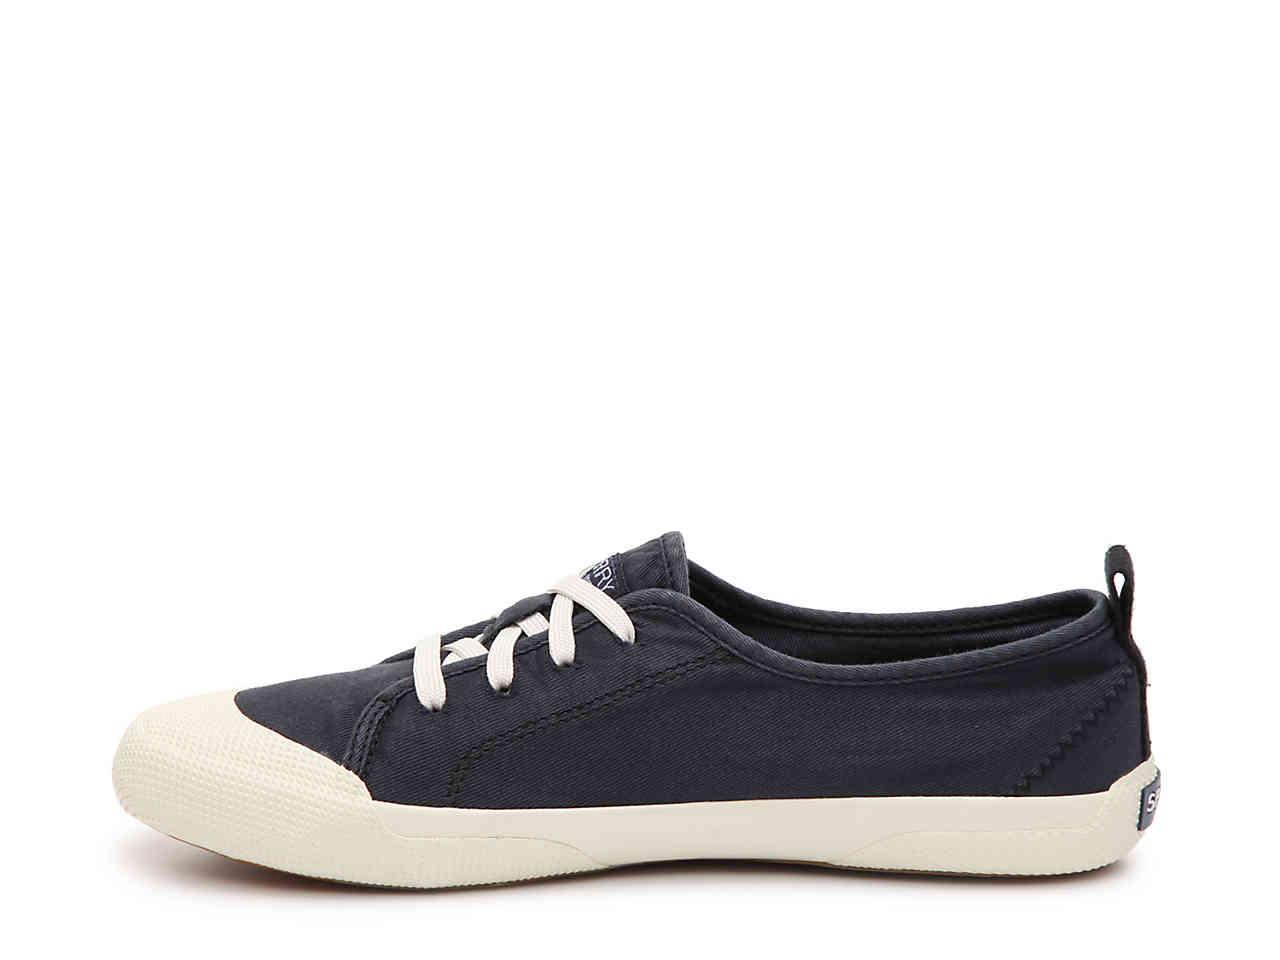 Sperry Top-Sider Canvas Breeze Sneaker